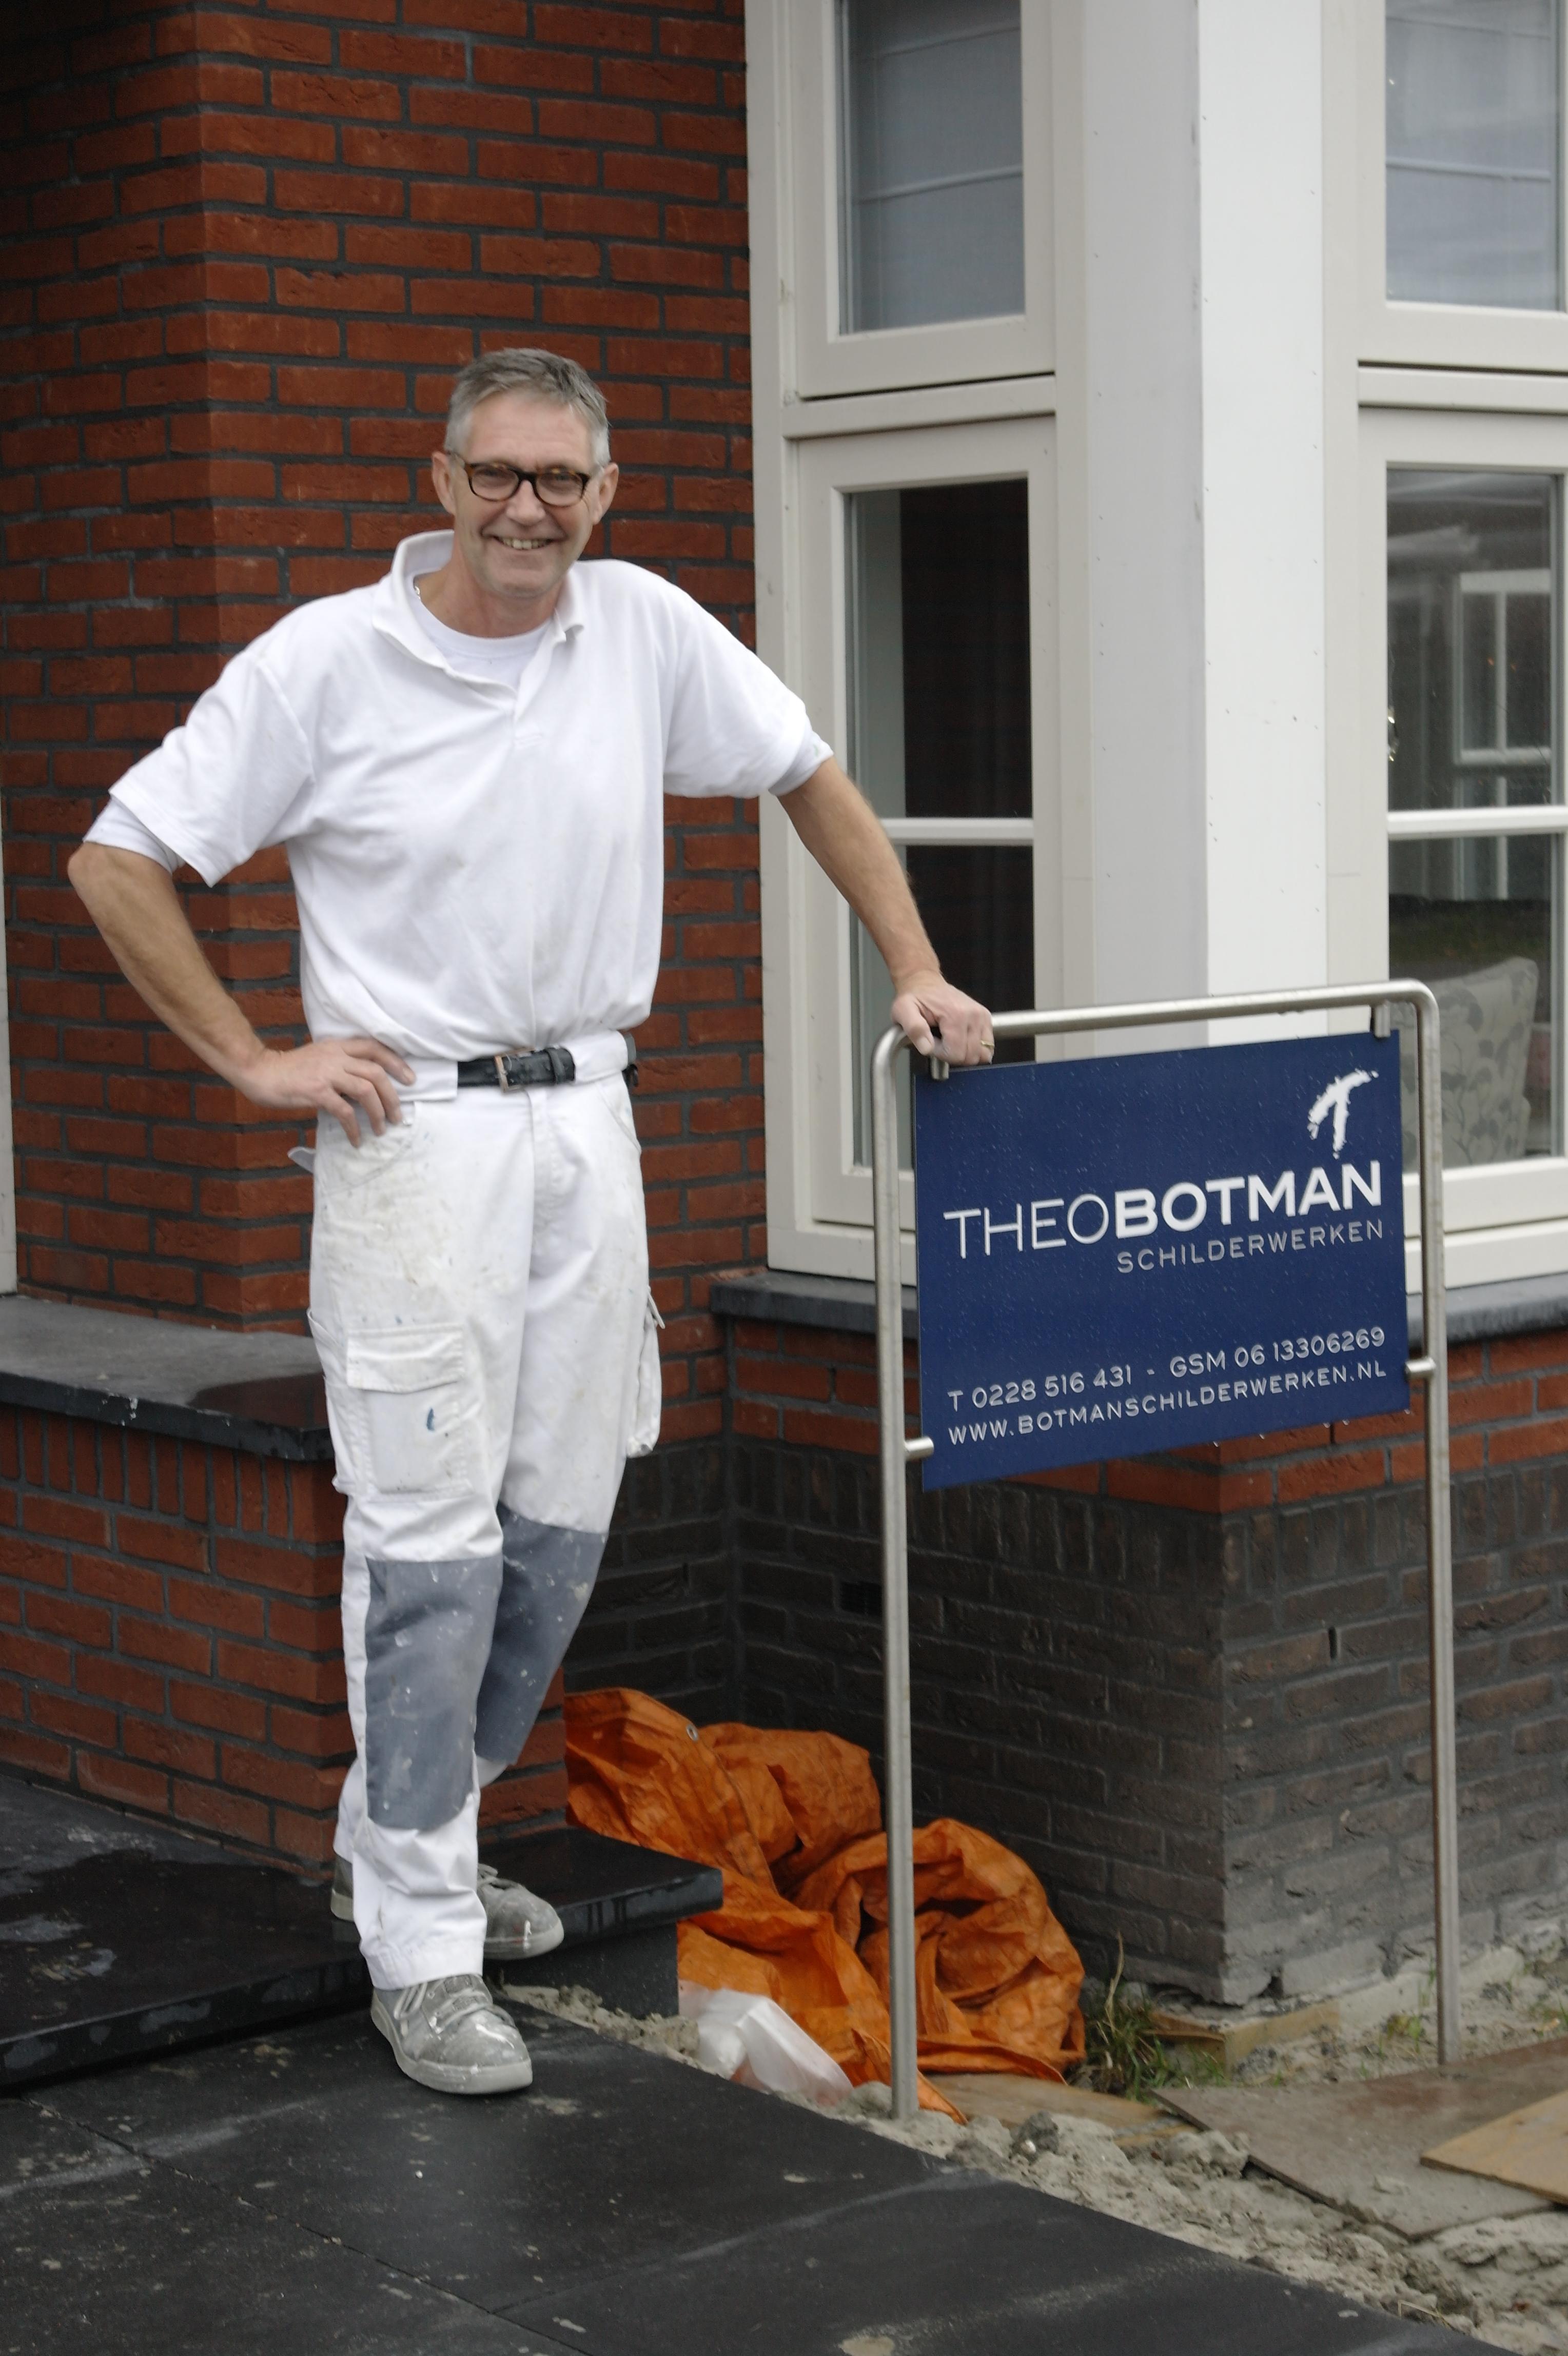 Theo Botman